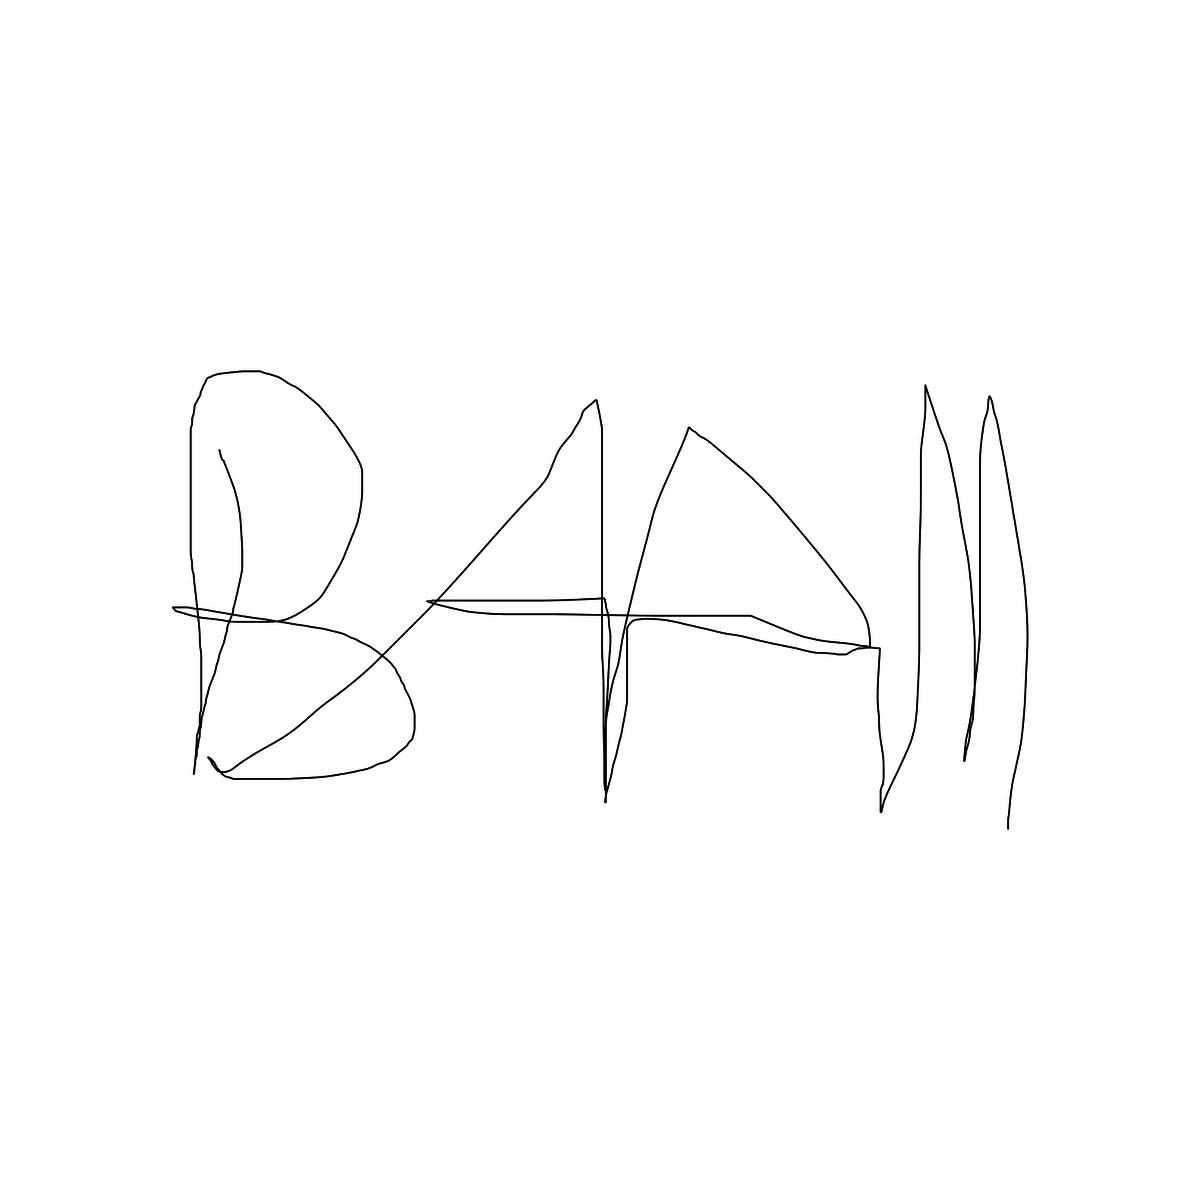 BAAAM drawing#8456 lat:44.7908134460449200lng: 20.5242462158203120